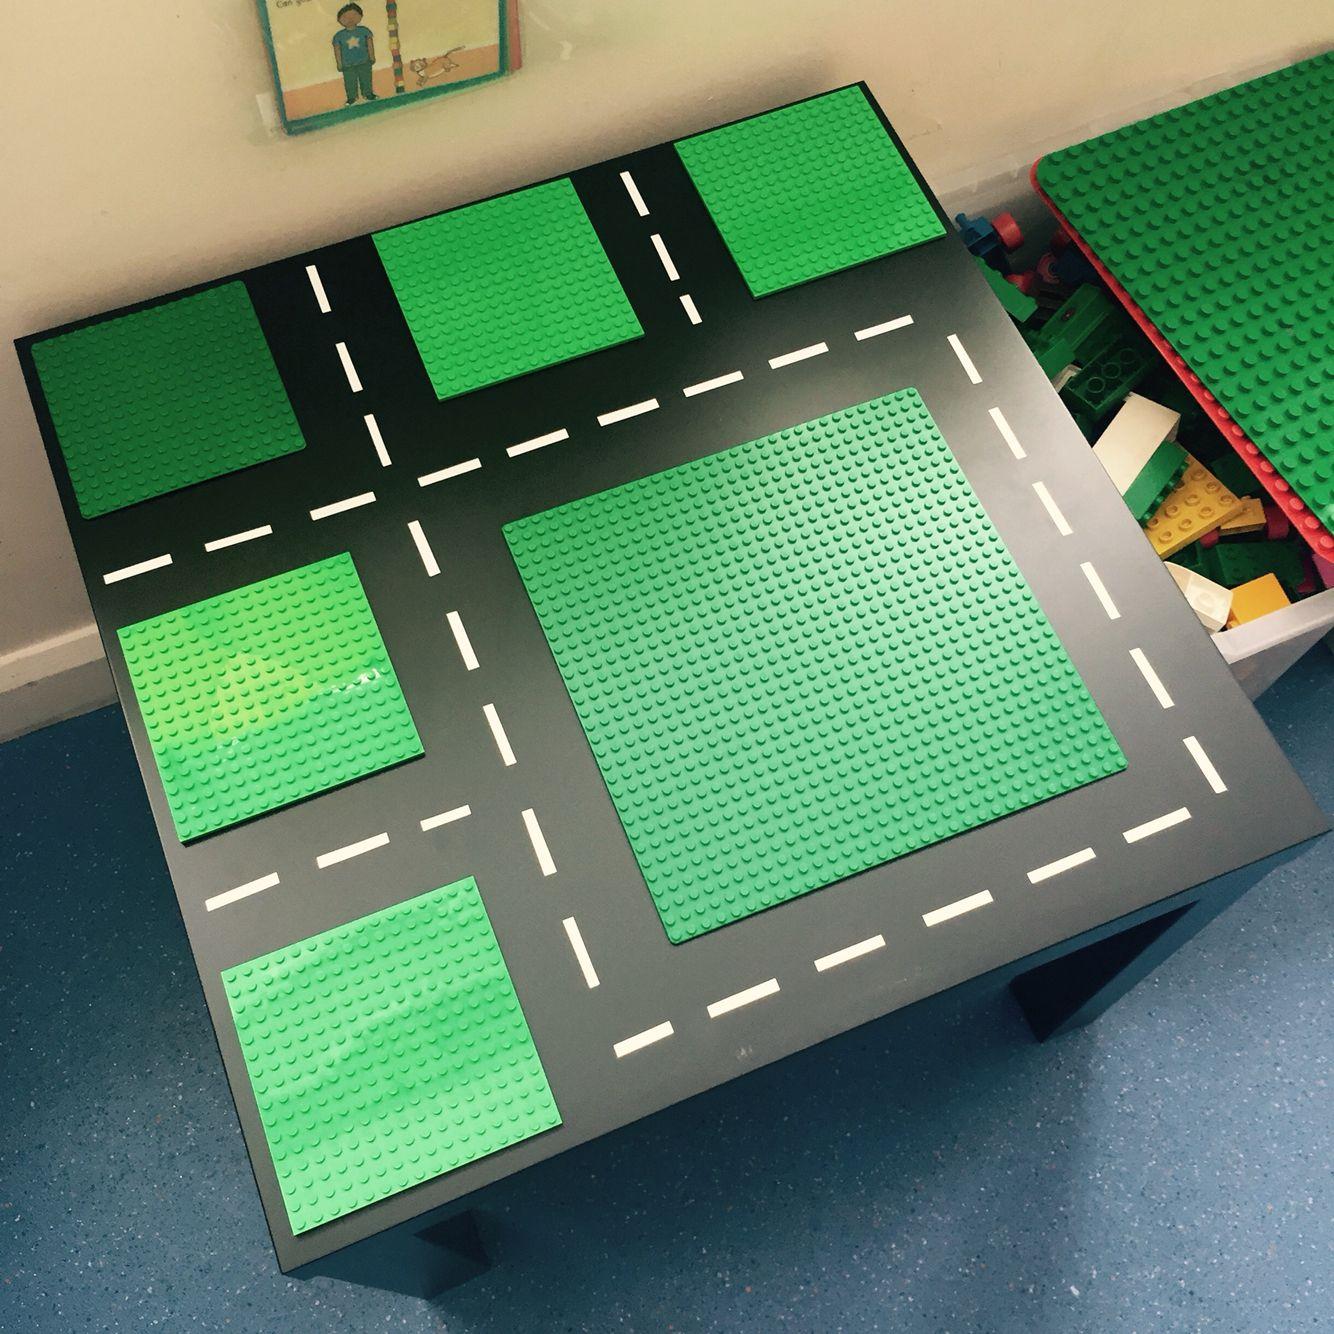 Lego table created using an IKEA lack table, Lego baseplates and ...